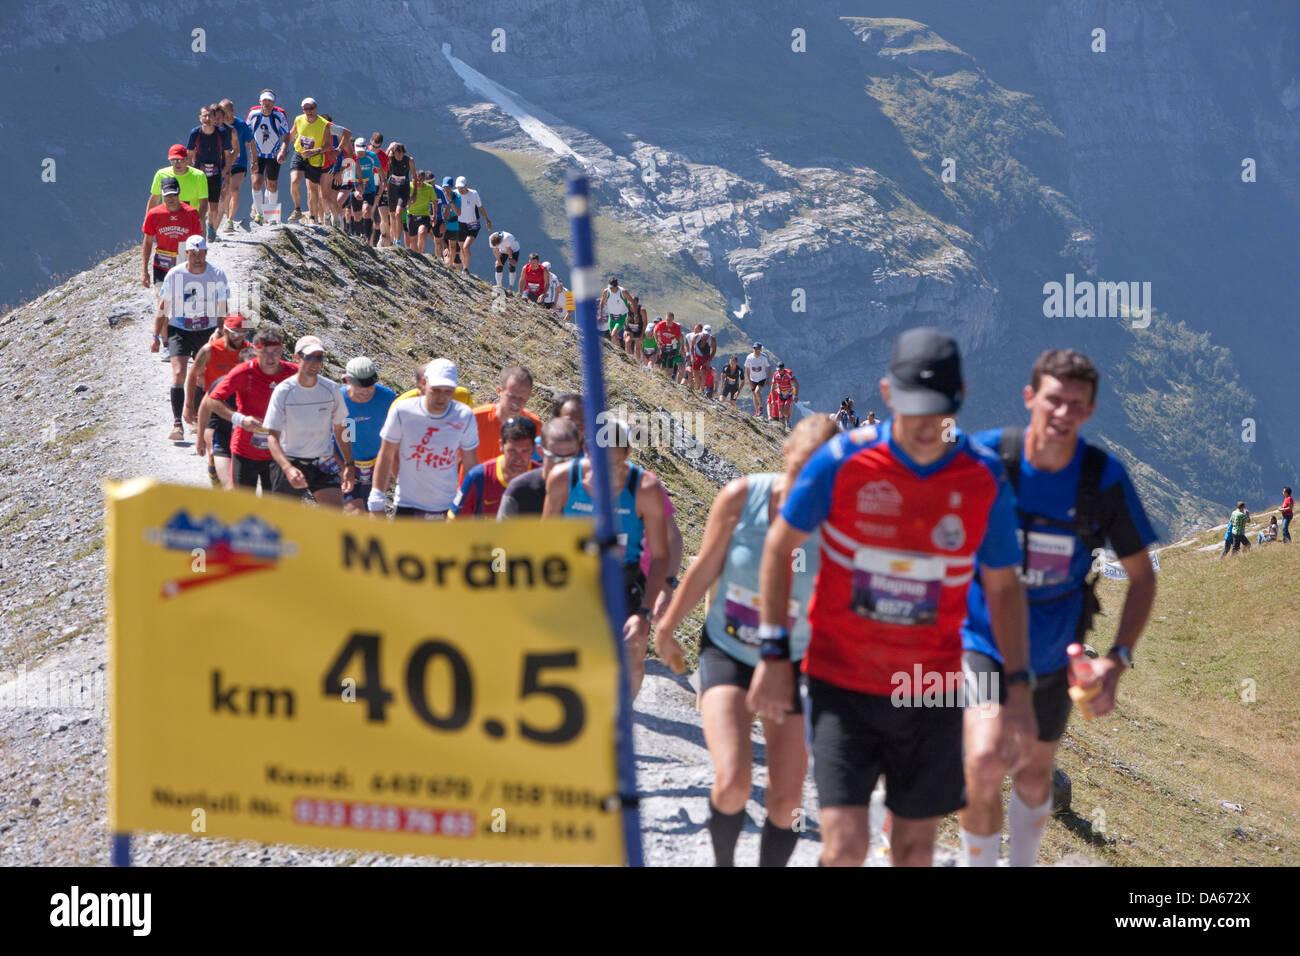 Jungfrau marathon, marathon, mountain run, run, sport, nicest mountain scenery, landscape, mountain, mountains, - Stock Image